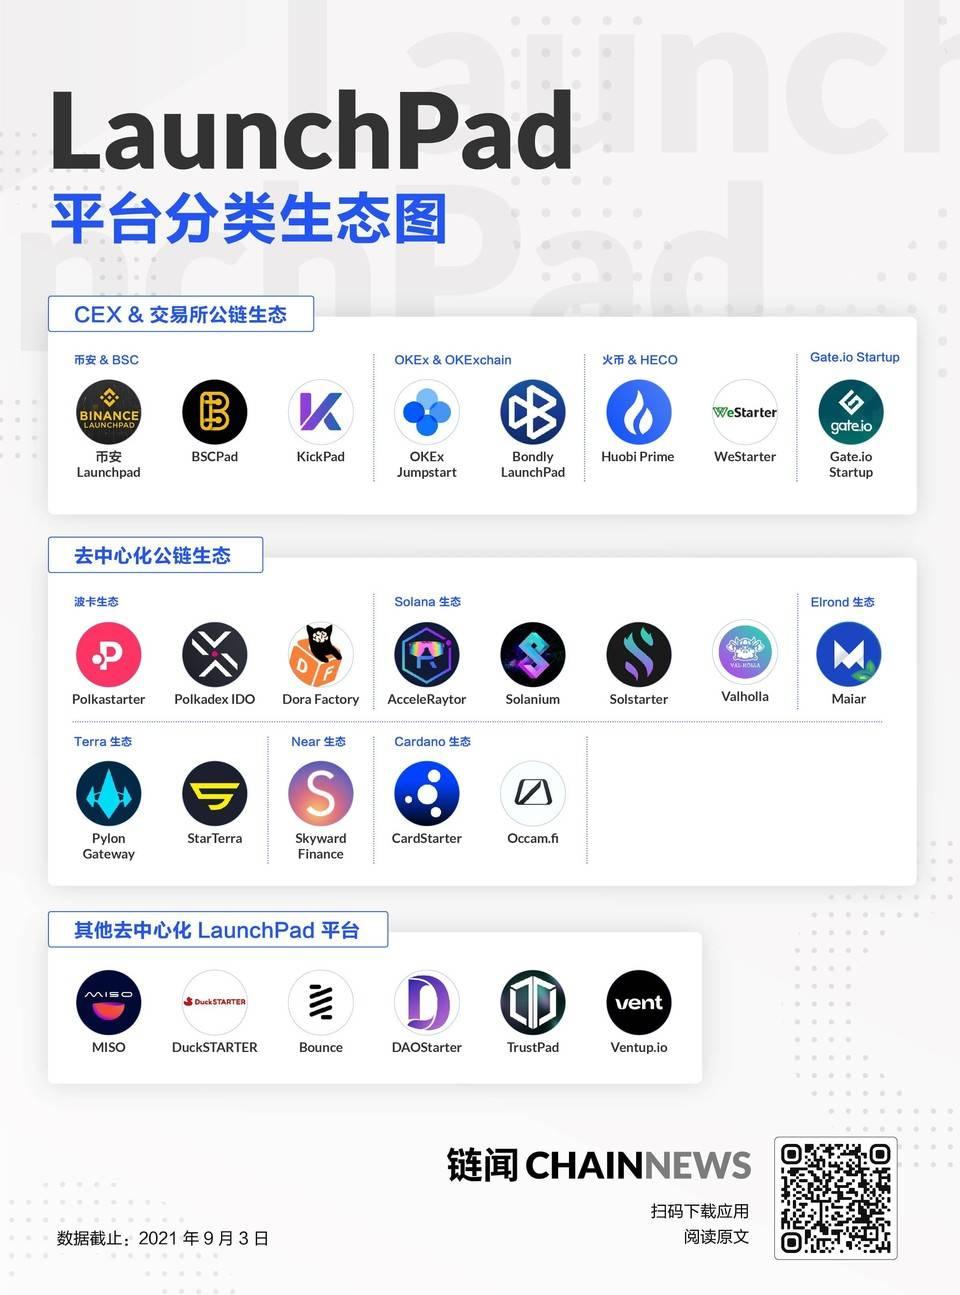 LaunchPad 一文速览:连接「项目方」和「投资人」,成为加密生态愈发重要的「关键少数」